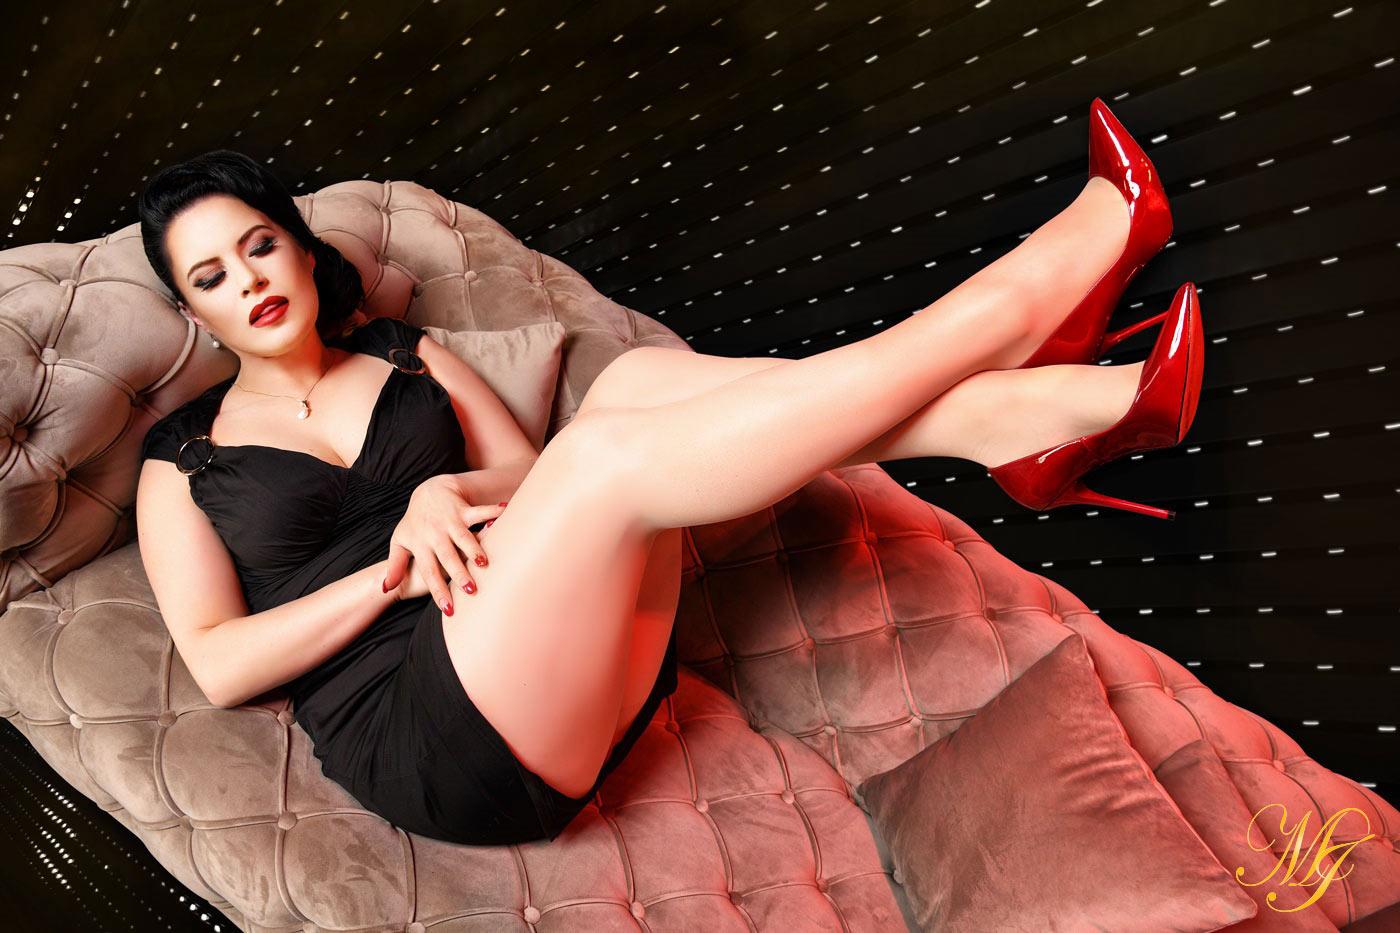 Erotik ladys Your Lust